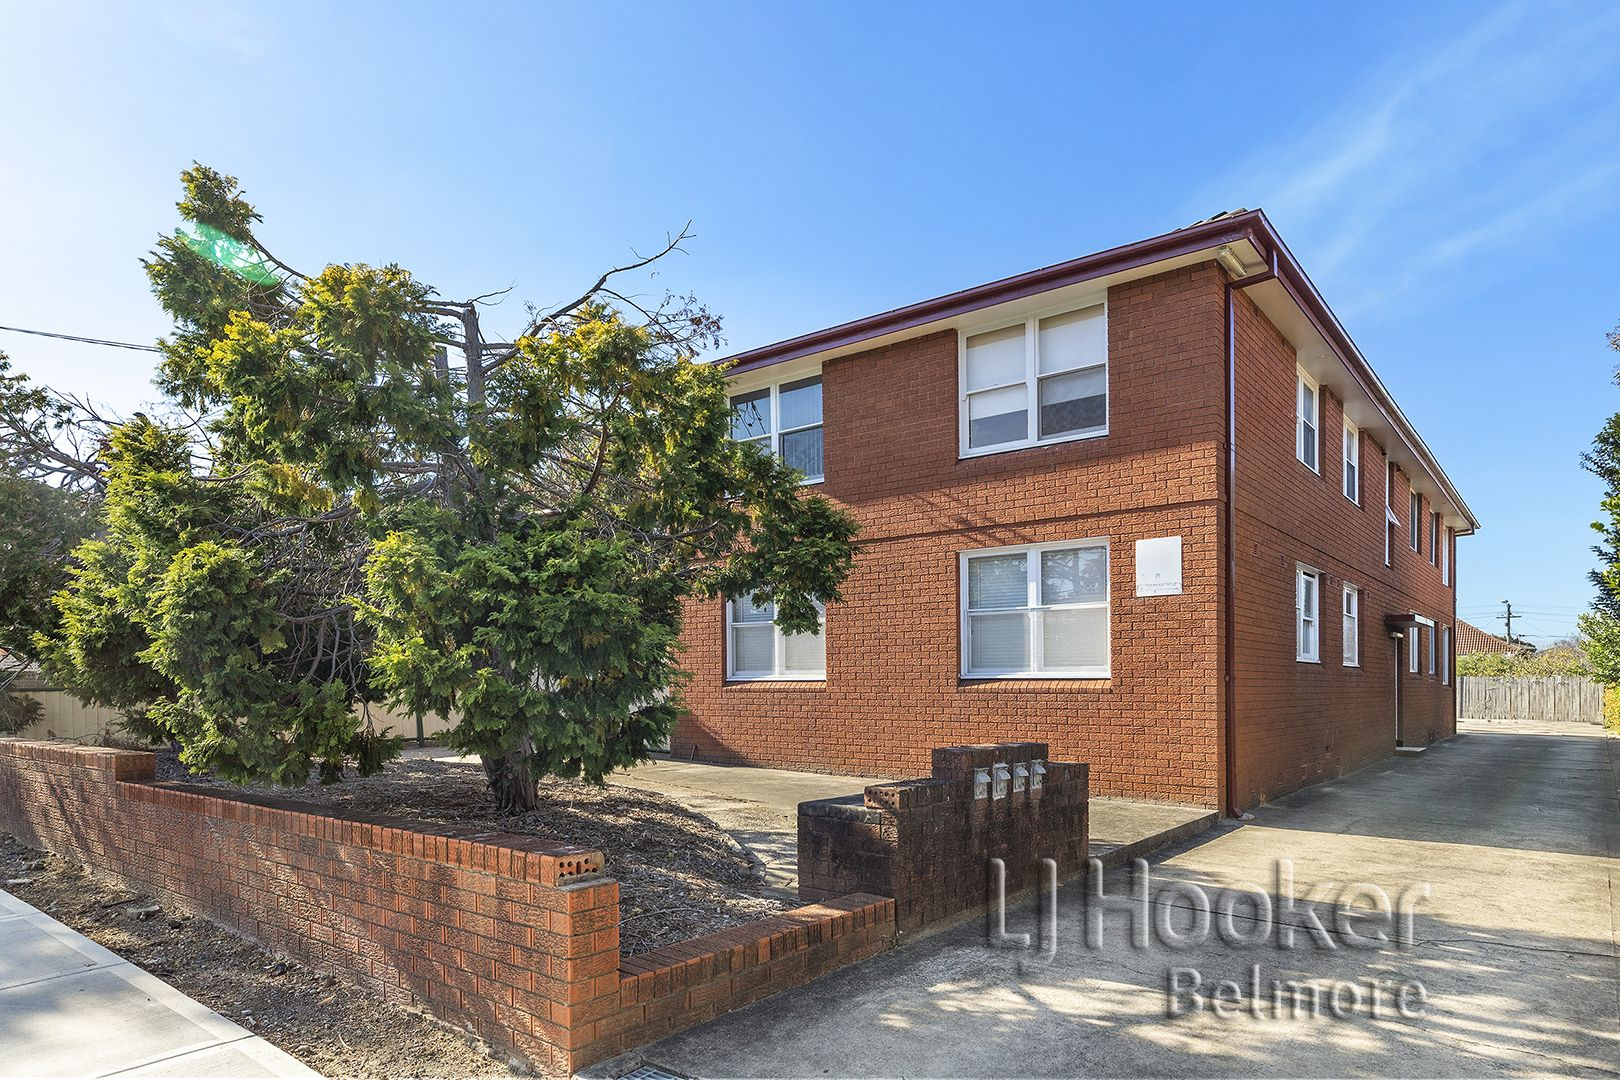 46 Platts Avenue, Belmore NSW 2192, Image 0